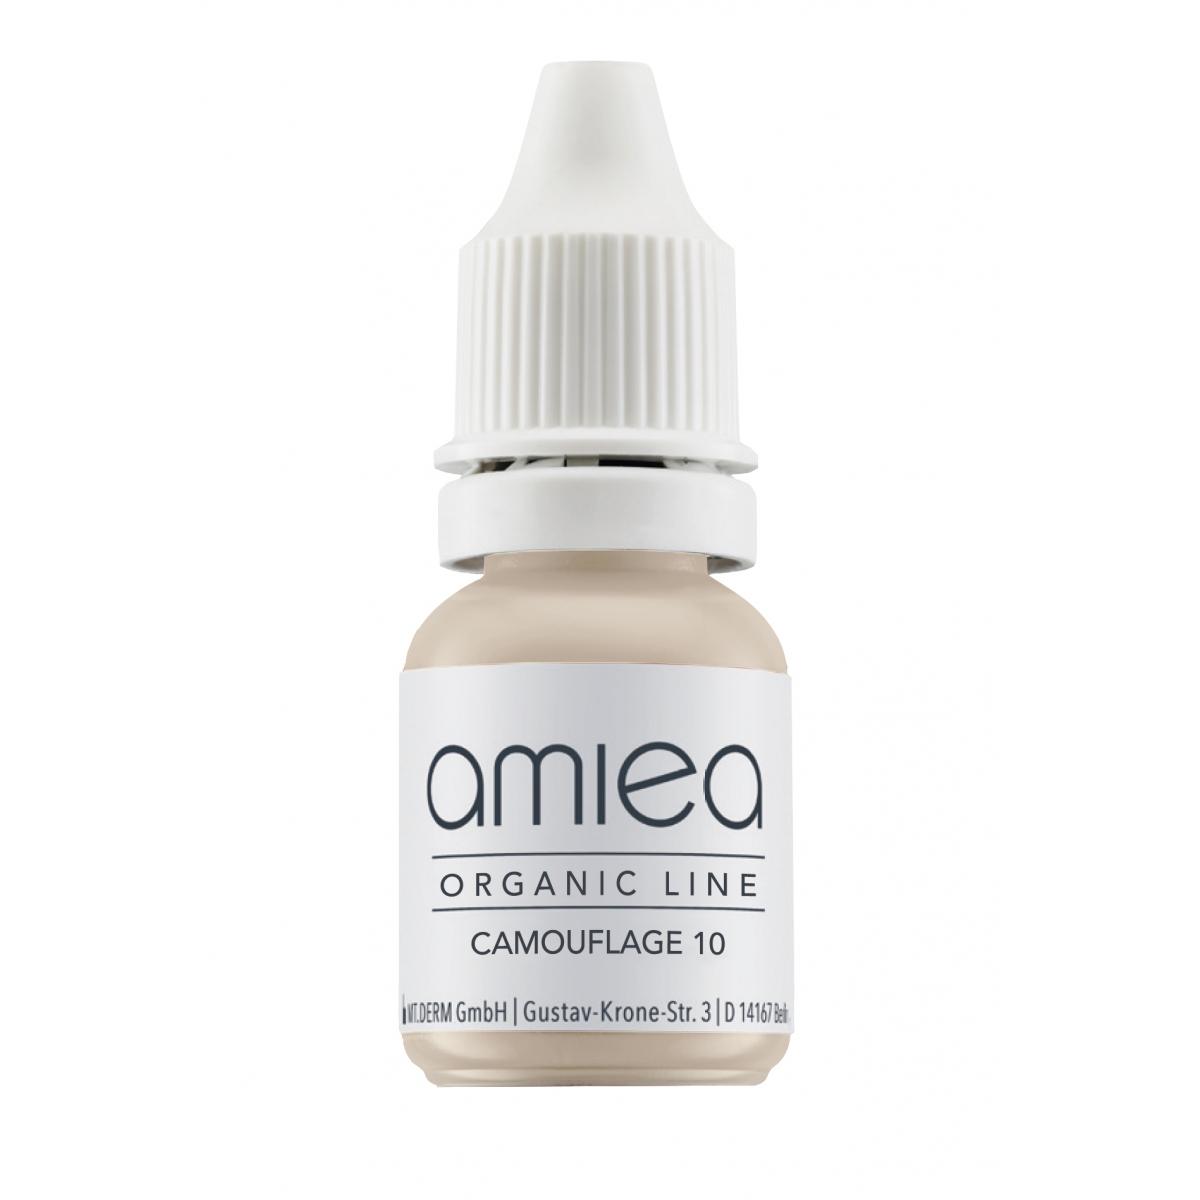 ORGANIC LINE (5ml)  - PIGMENT CAMOUFLAGE 10 ORGANICLINE AMIEA (5 ml)